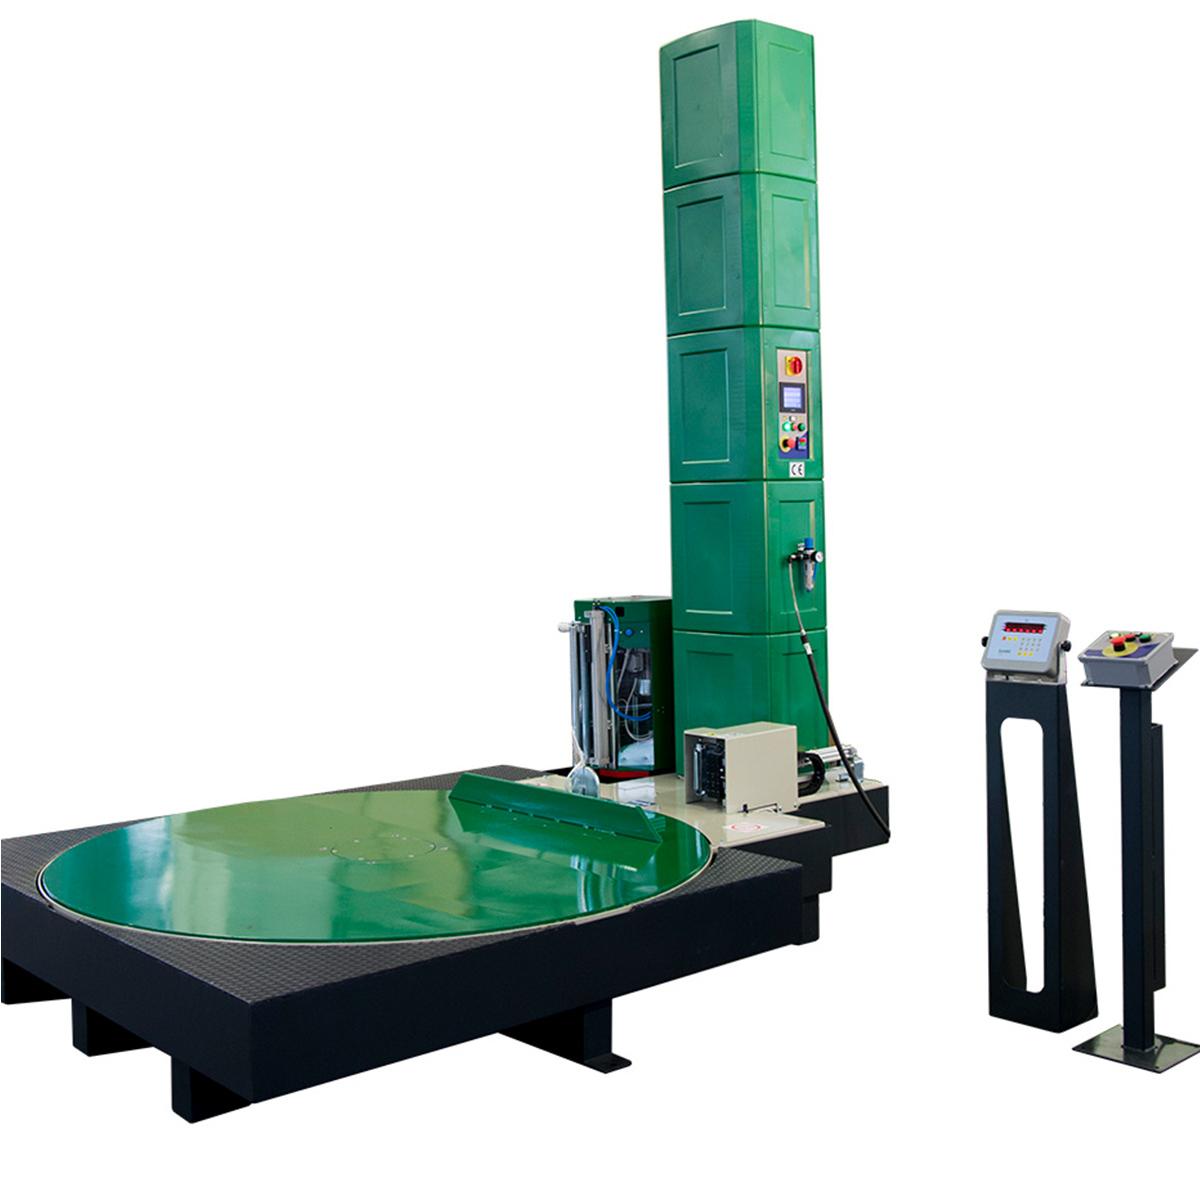 Envolvedora enfardadora semiautomática plataforma giratoria Spinny S500 unidad de pesaje